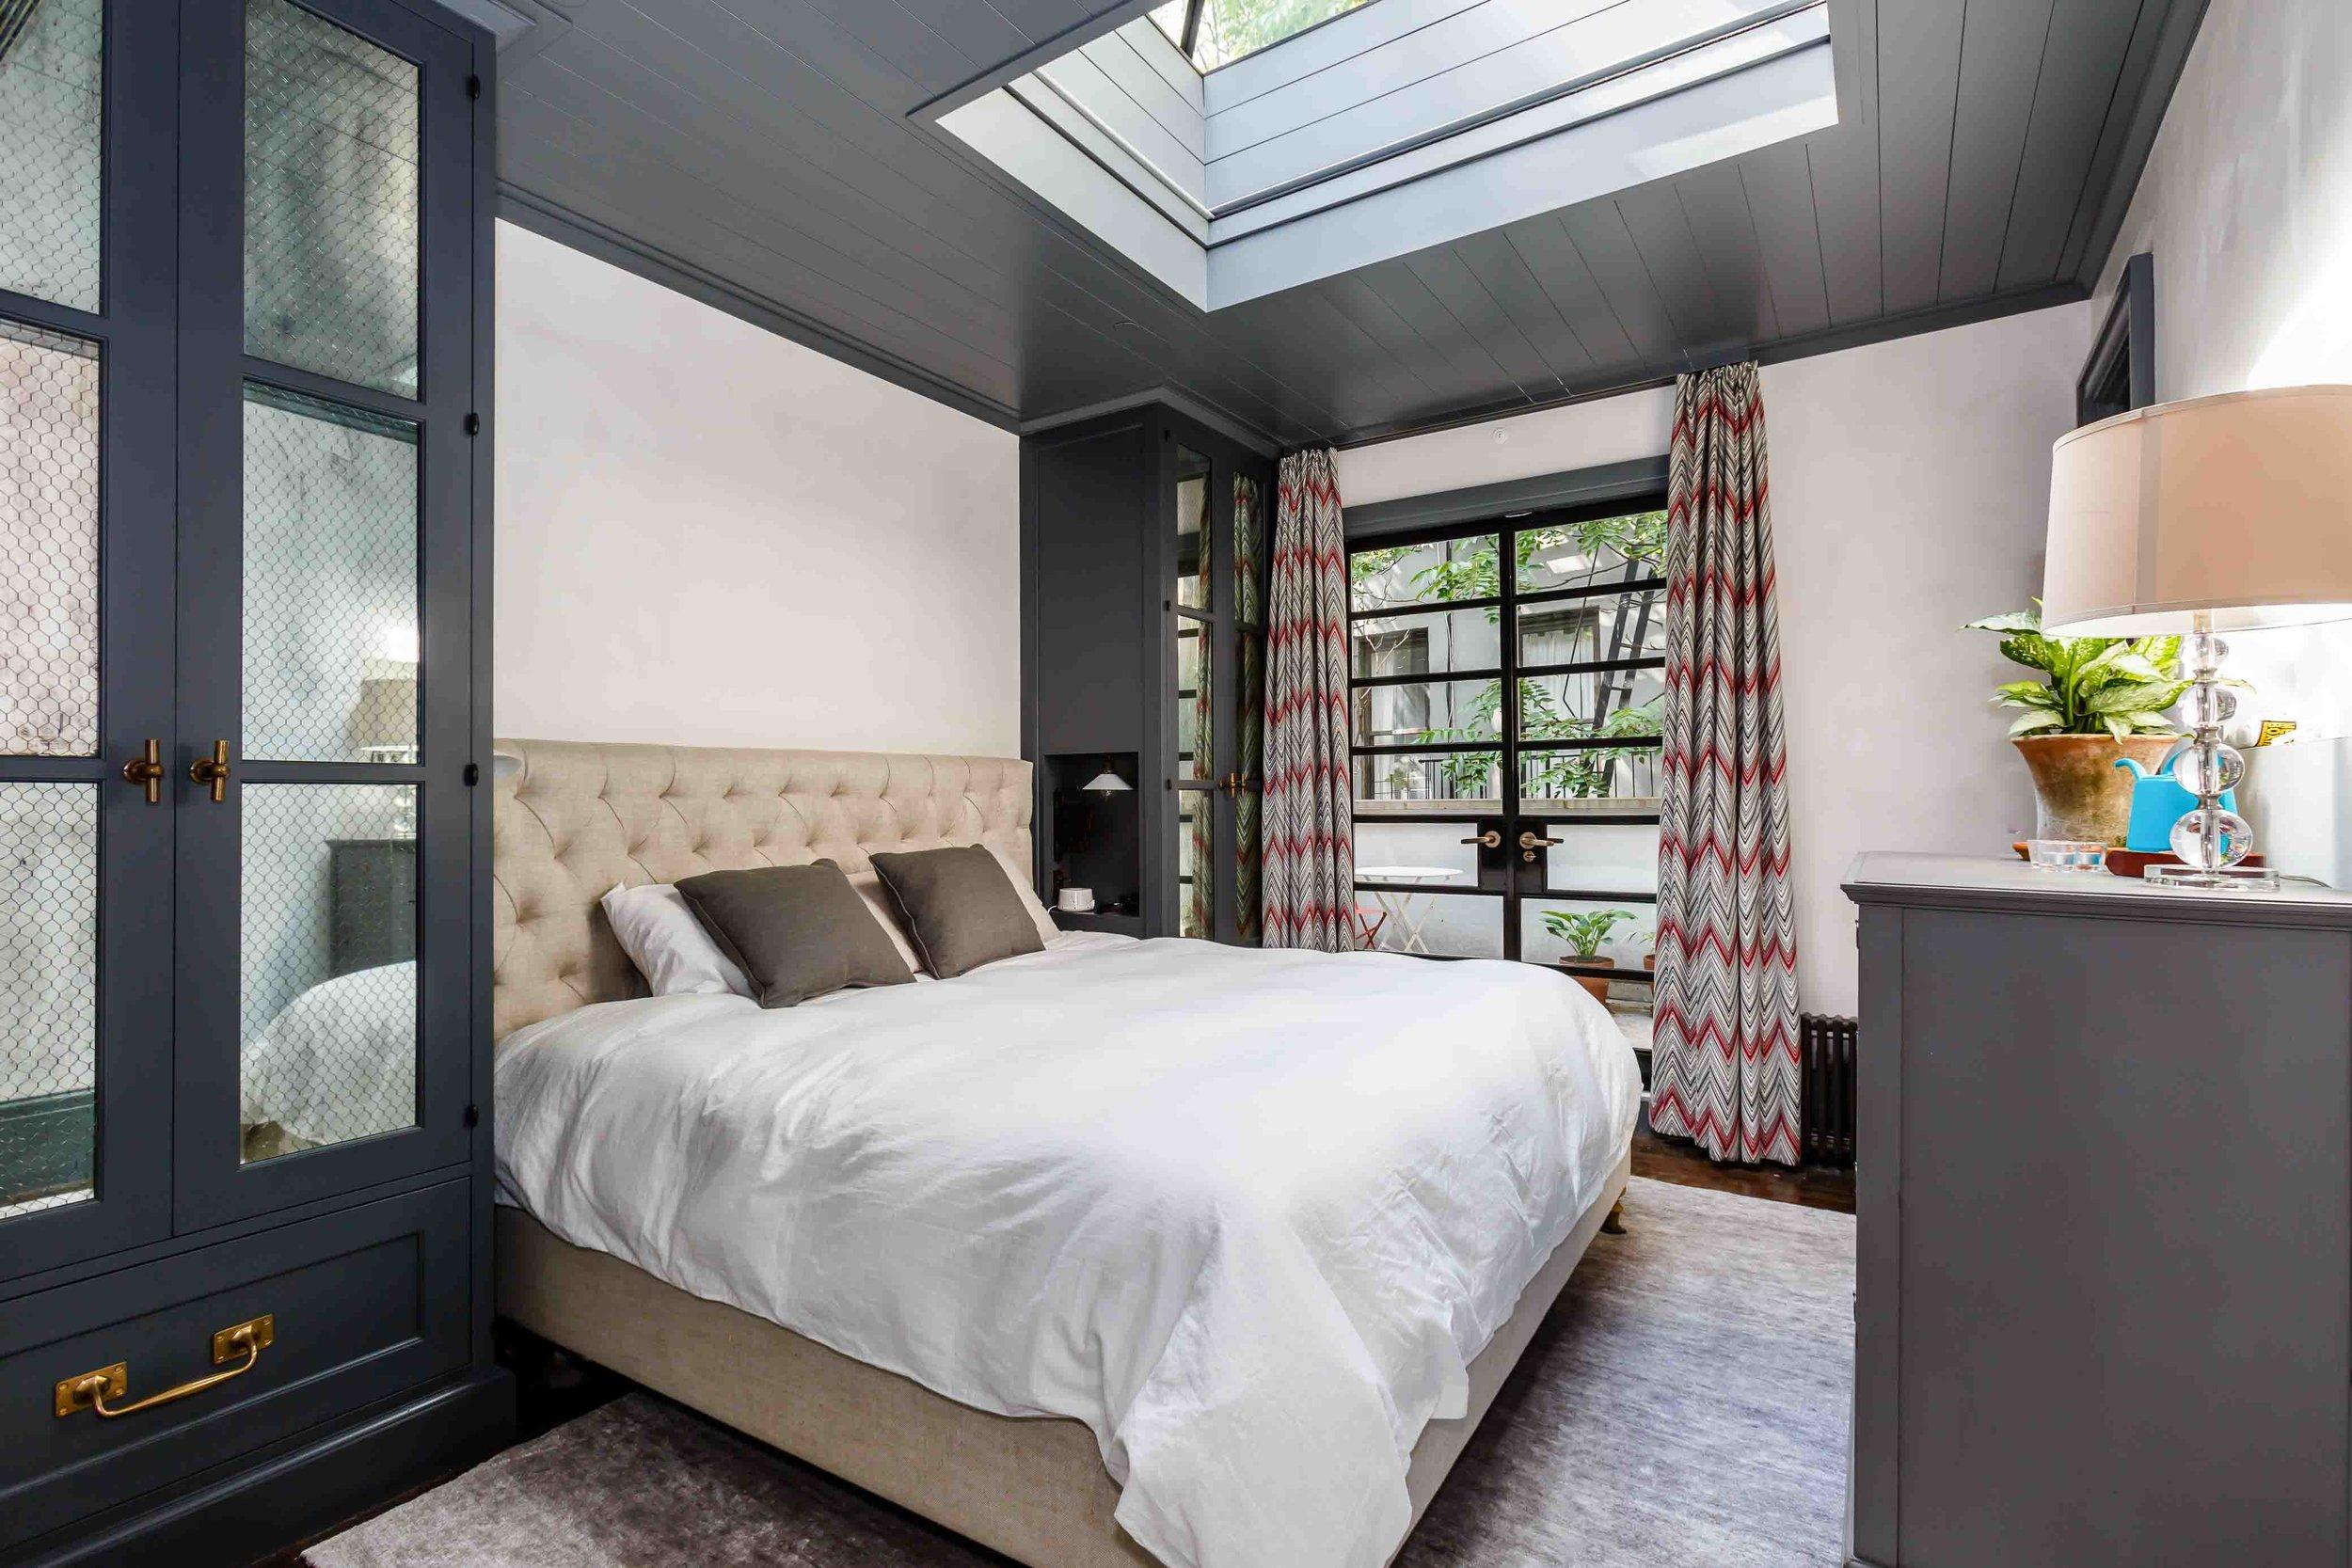 london-property-photos-photography-camden-bedroom-1.jpg